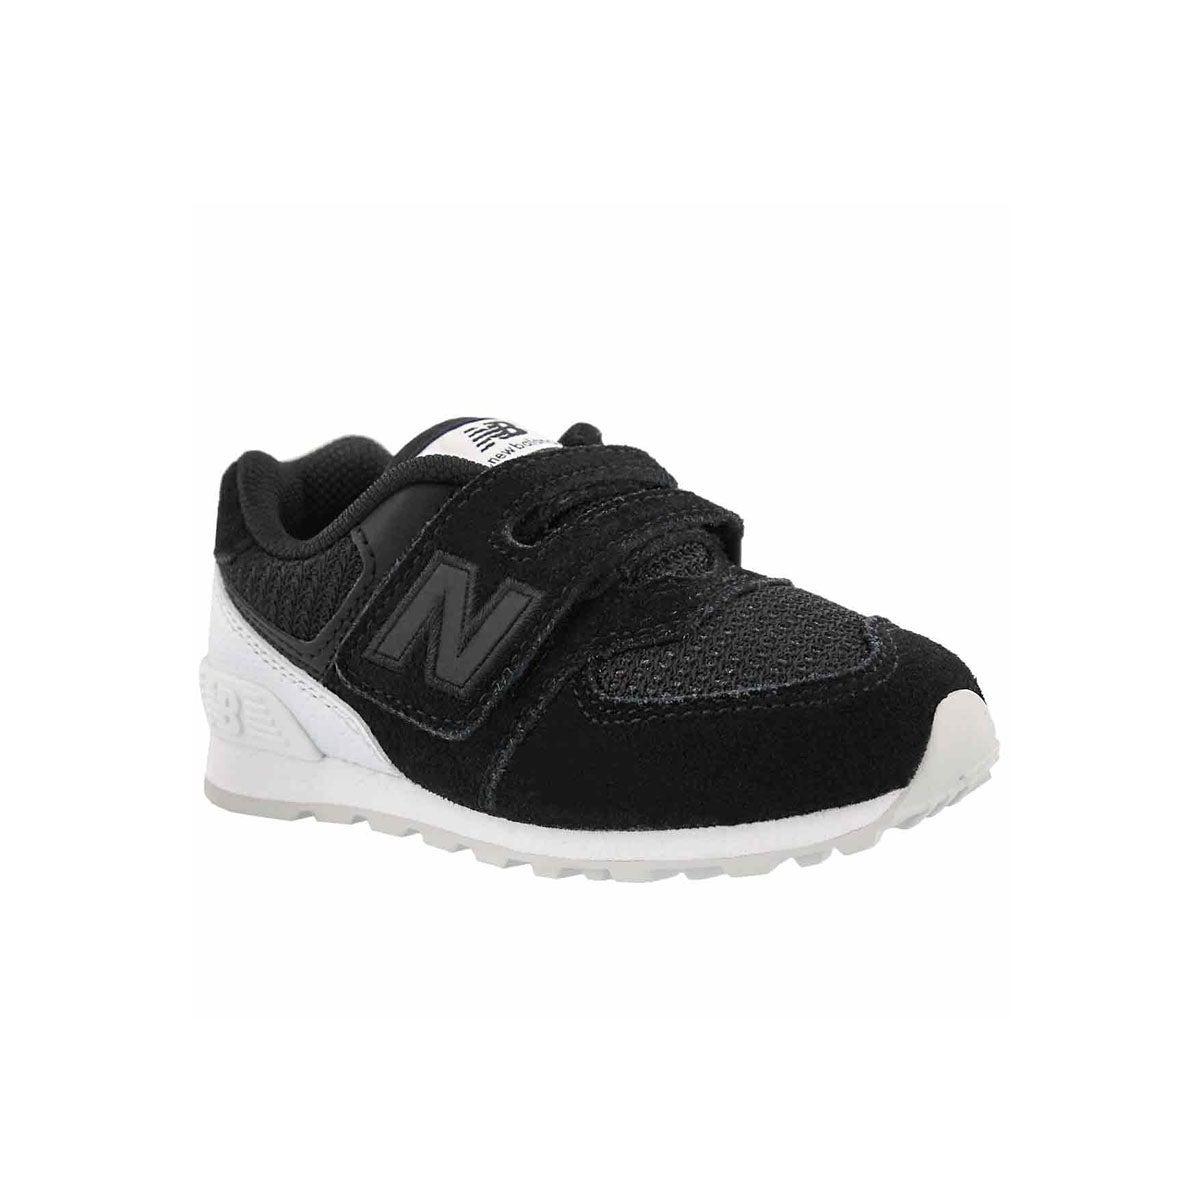 Infants' 574 black/white sneakers